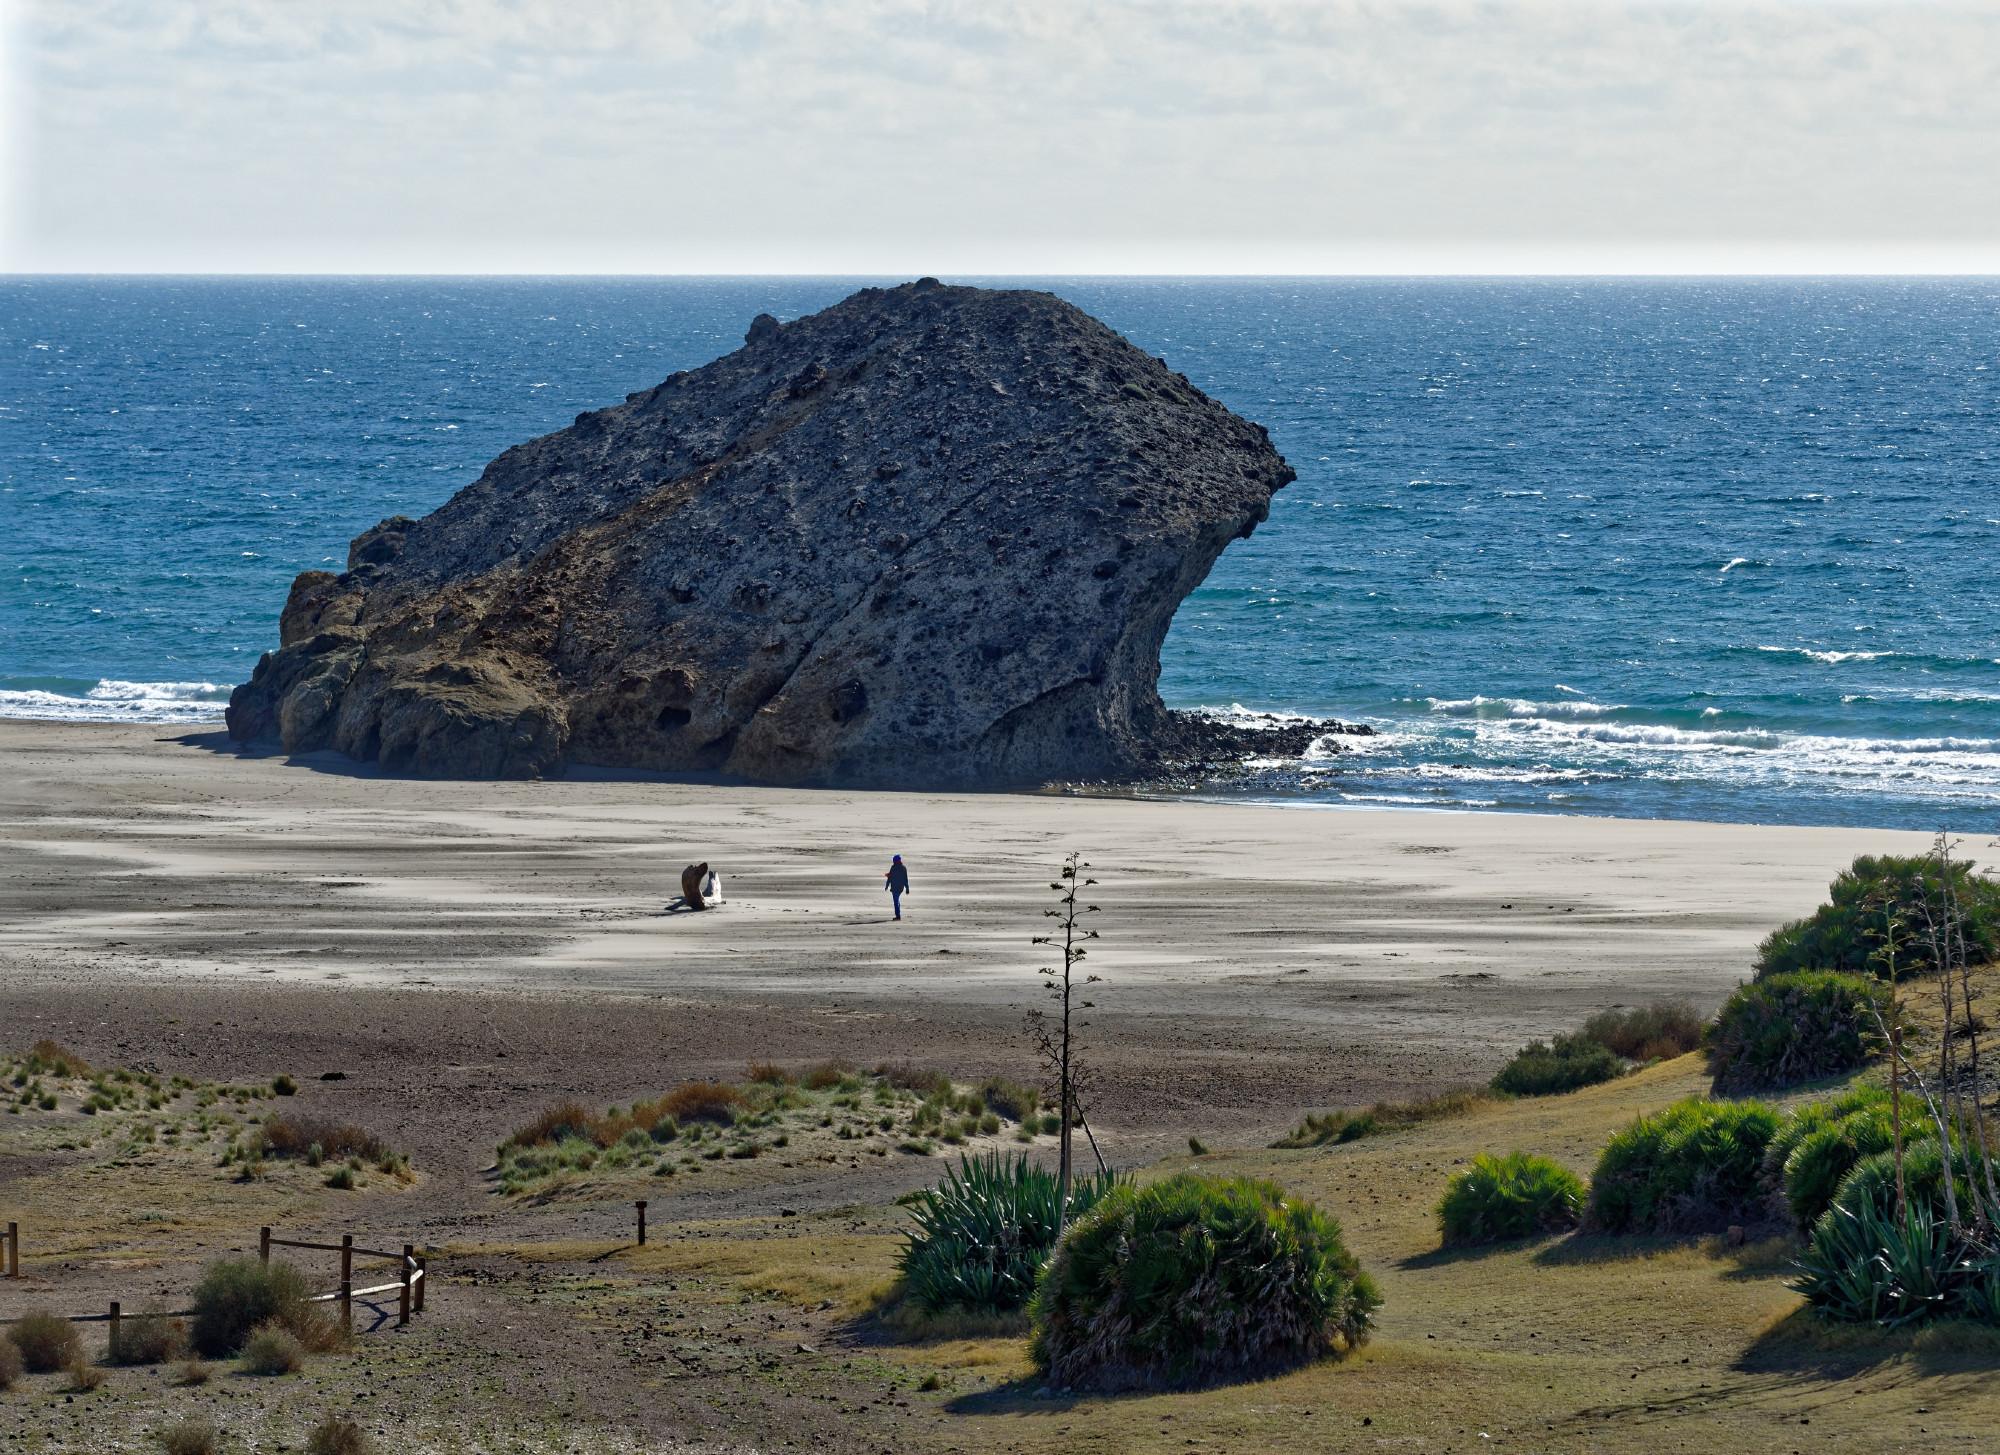 171214-San Jose-Playa del Monsul (Cabo de Gata-Andalousie) (144)